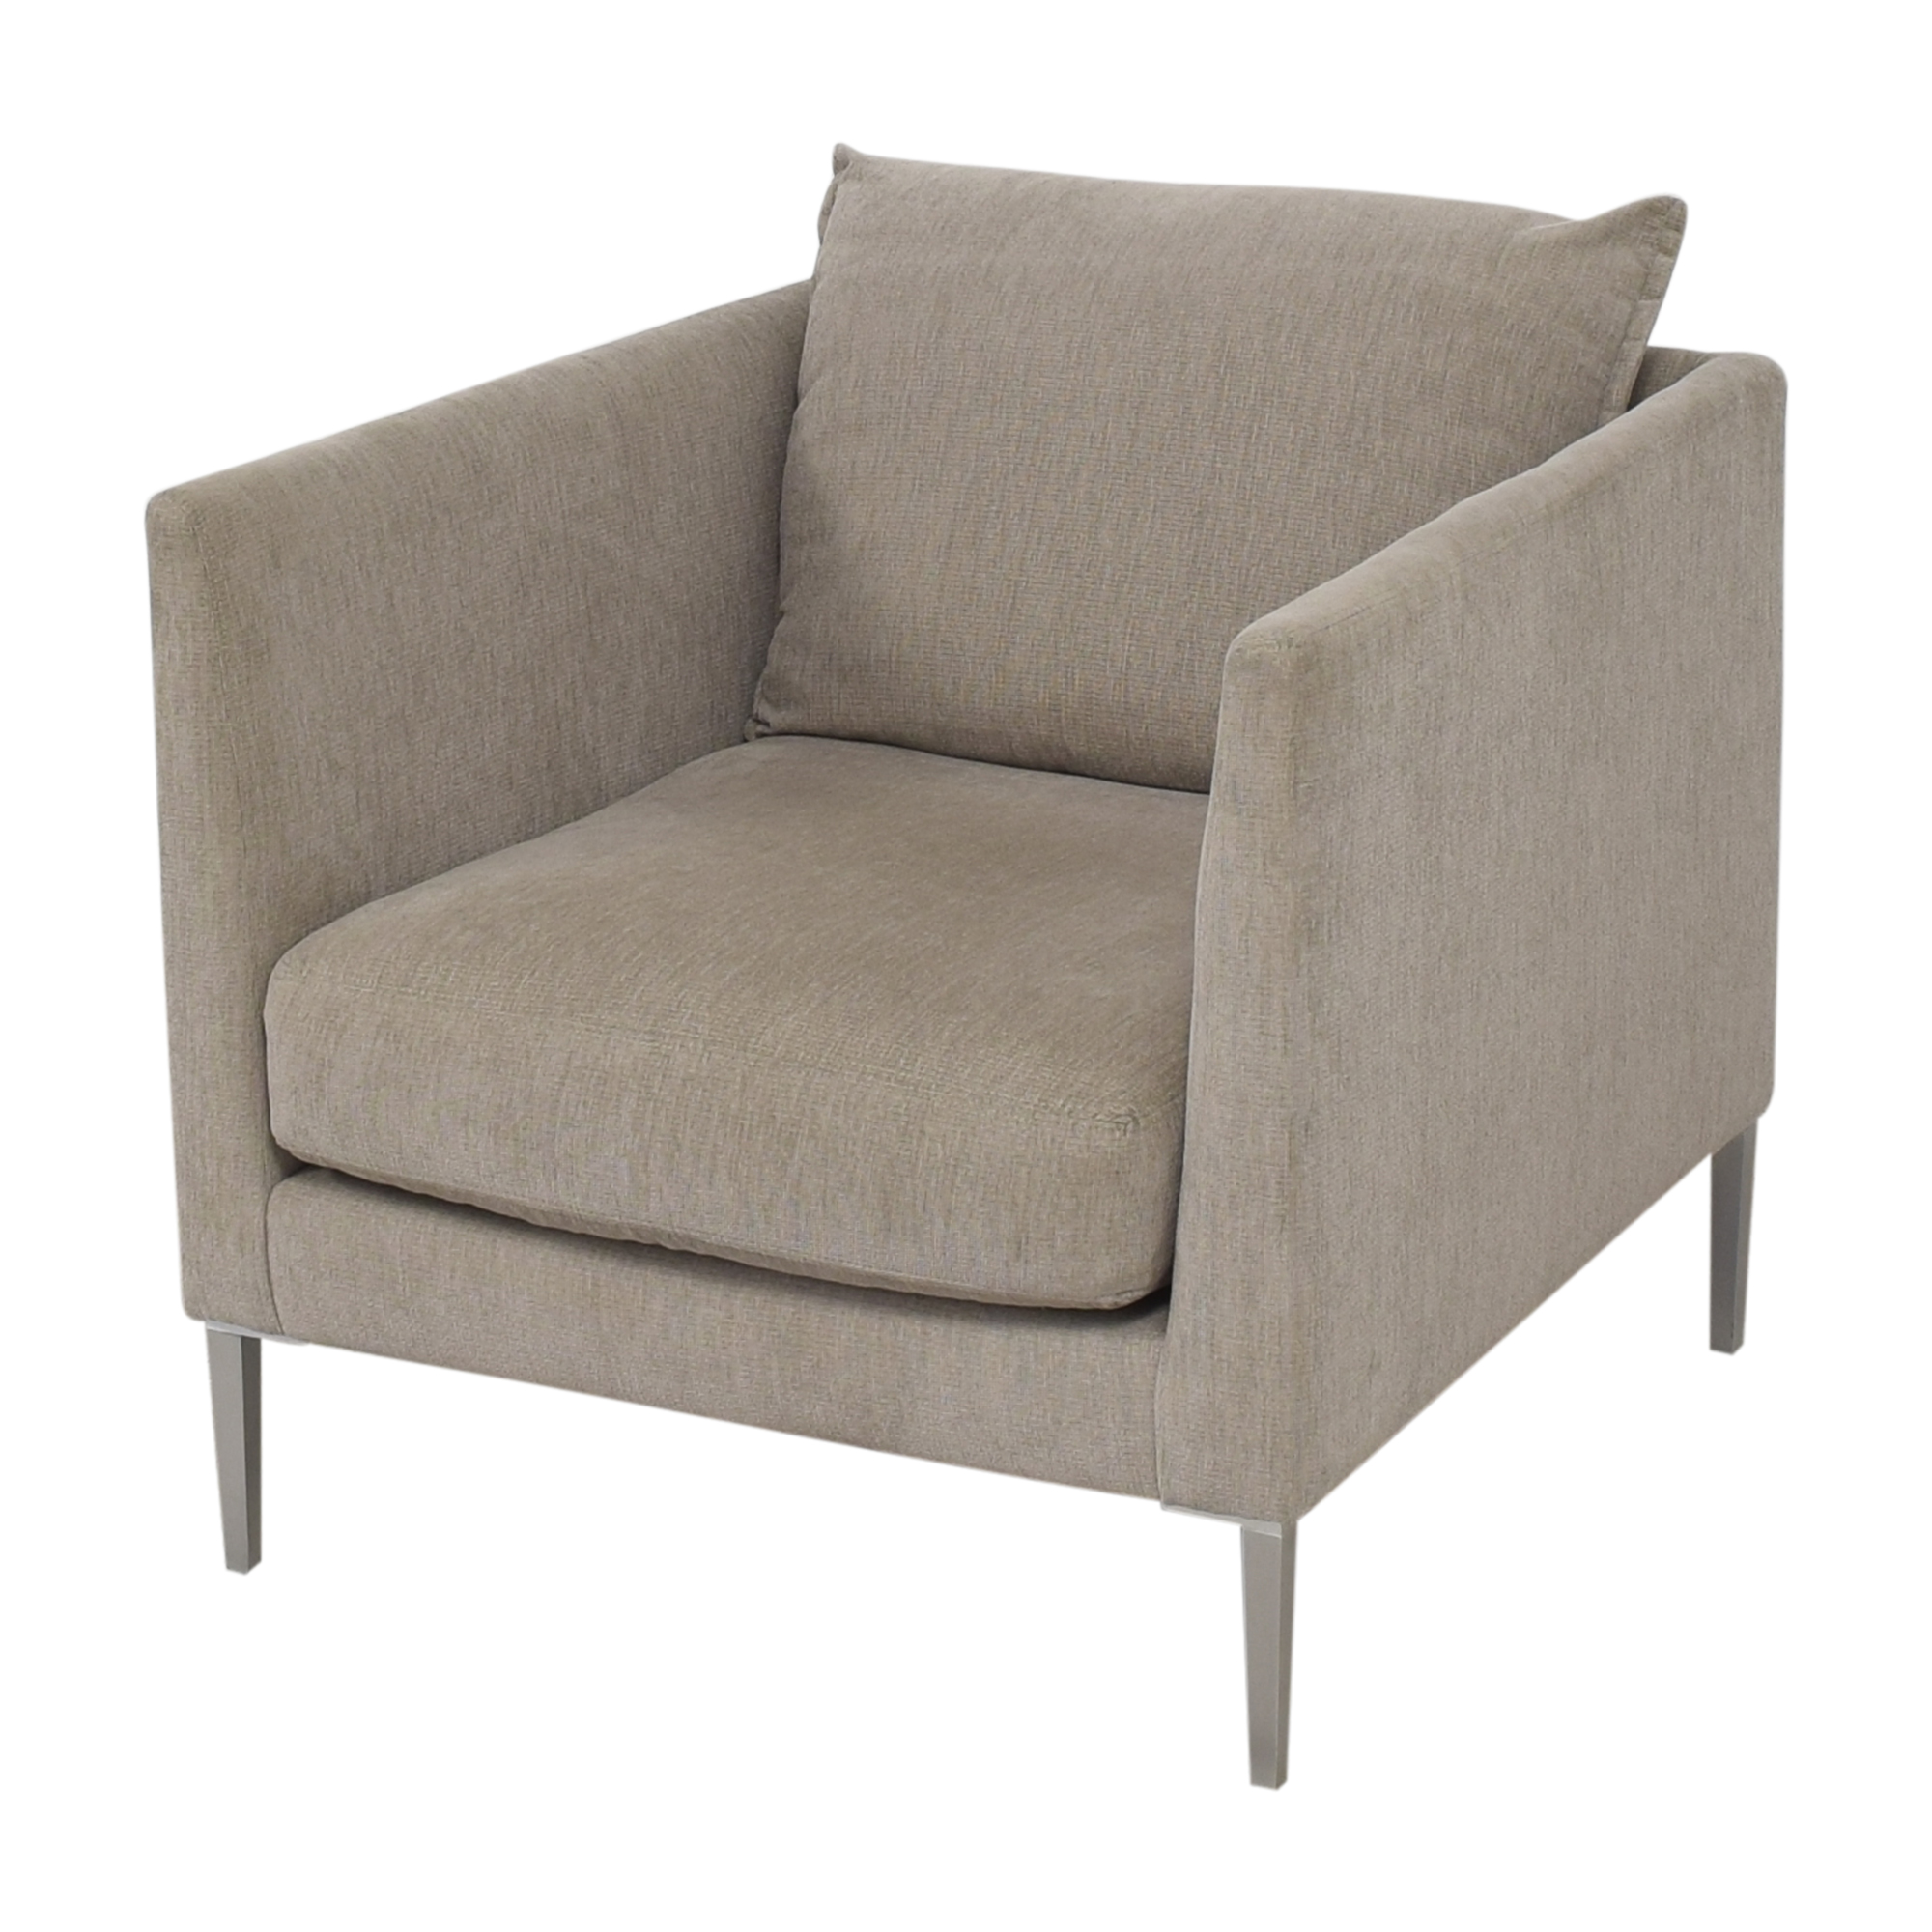 shop Room & Board Vela Chair Room & Board Chairs